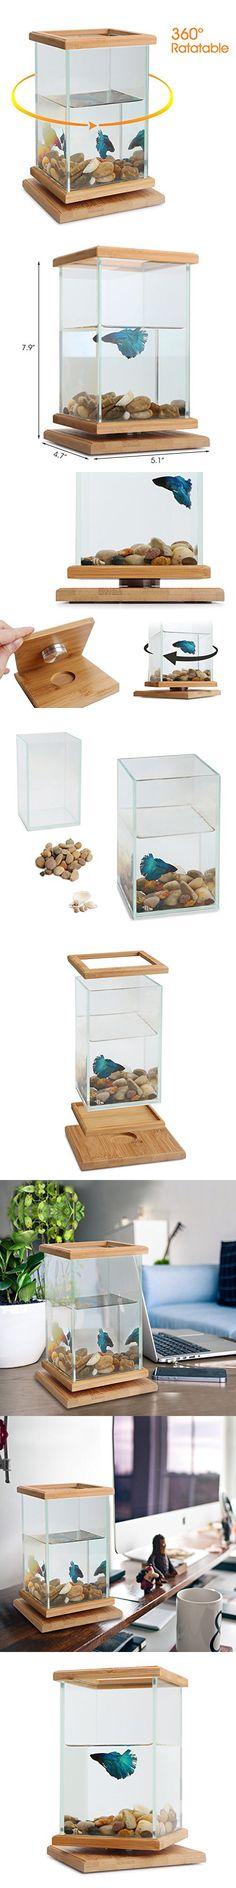 Rotatable Fish Bowls, Segarty Cool Unique Design Small Square Glass Vase Creative Aquarium Kit with Gravel and Shells, Desktop Decorative Fish Tank Could be Betta Fish & Gold Fish Pot